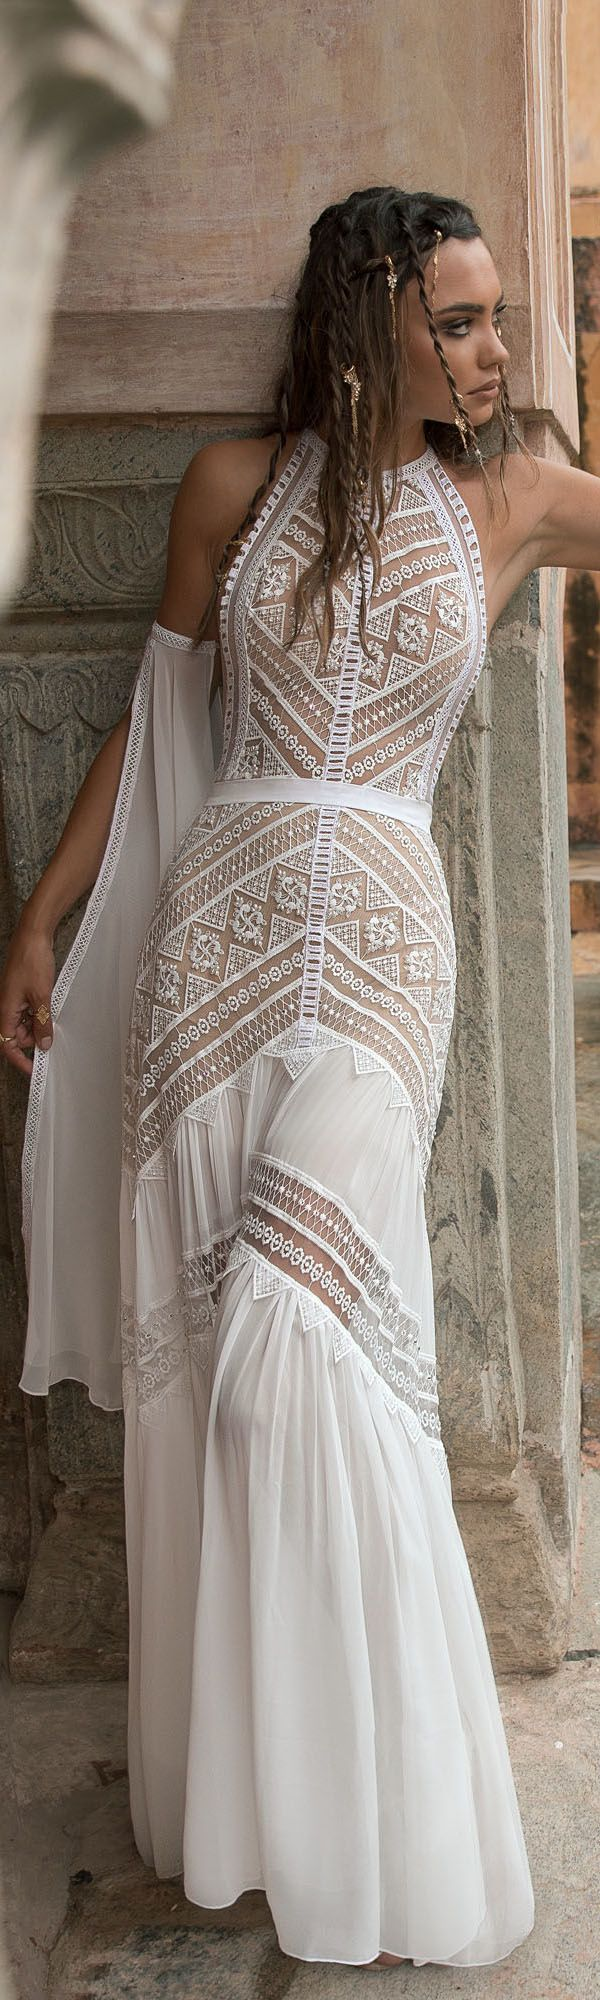 bohemian wedding dress from carchy roben4rp pinterest hochzeitskleid kleider and bohemian. Black Bedroom Furniture Sets. Home Design Ideas